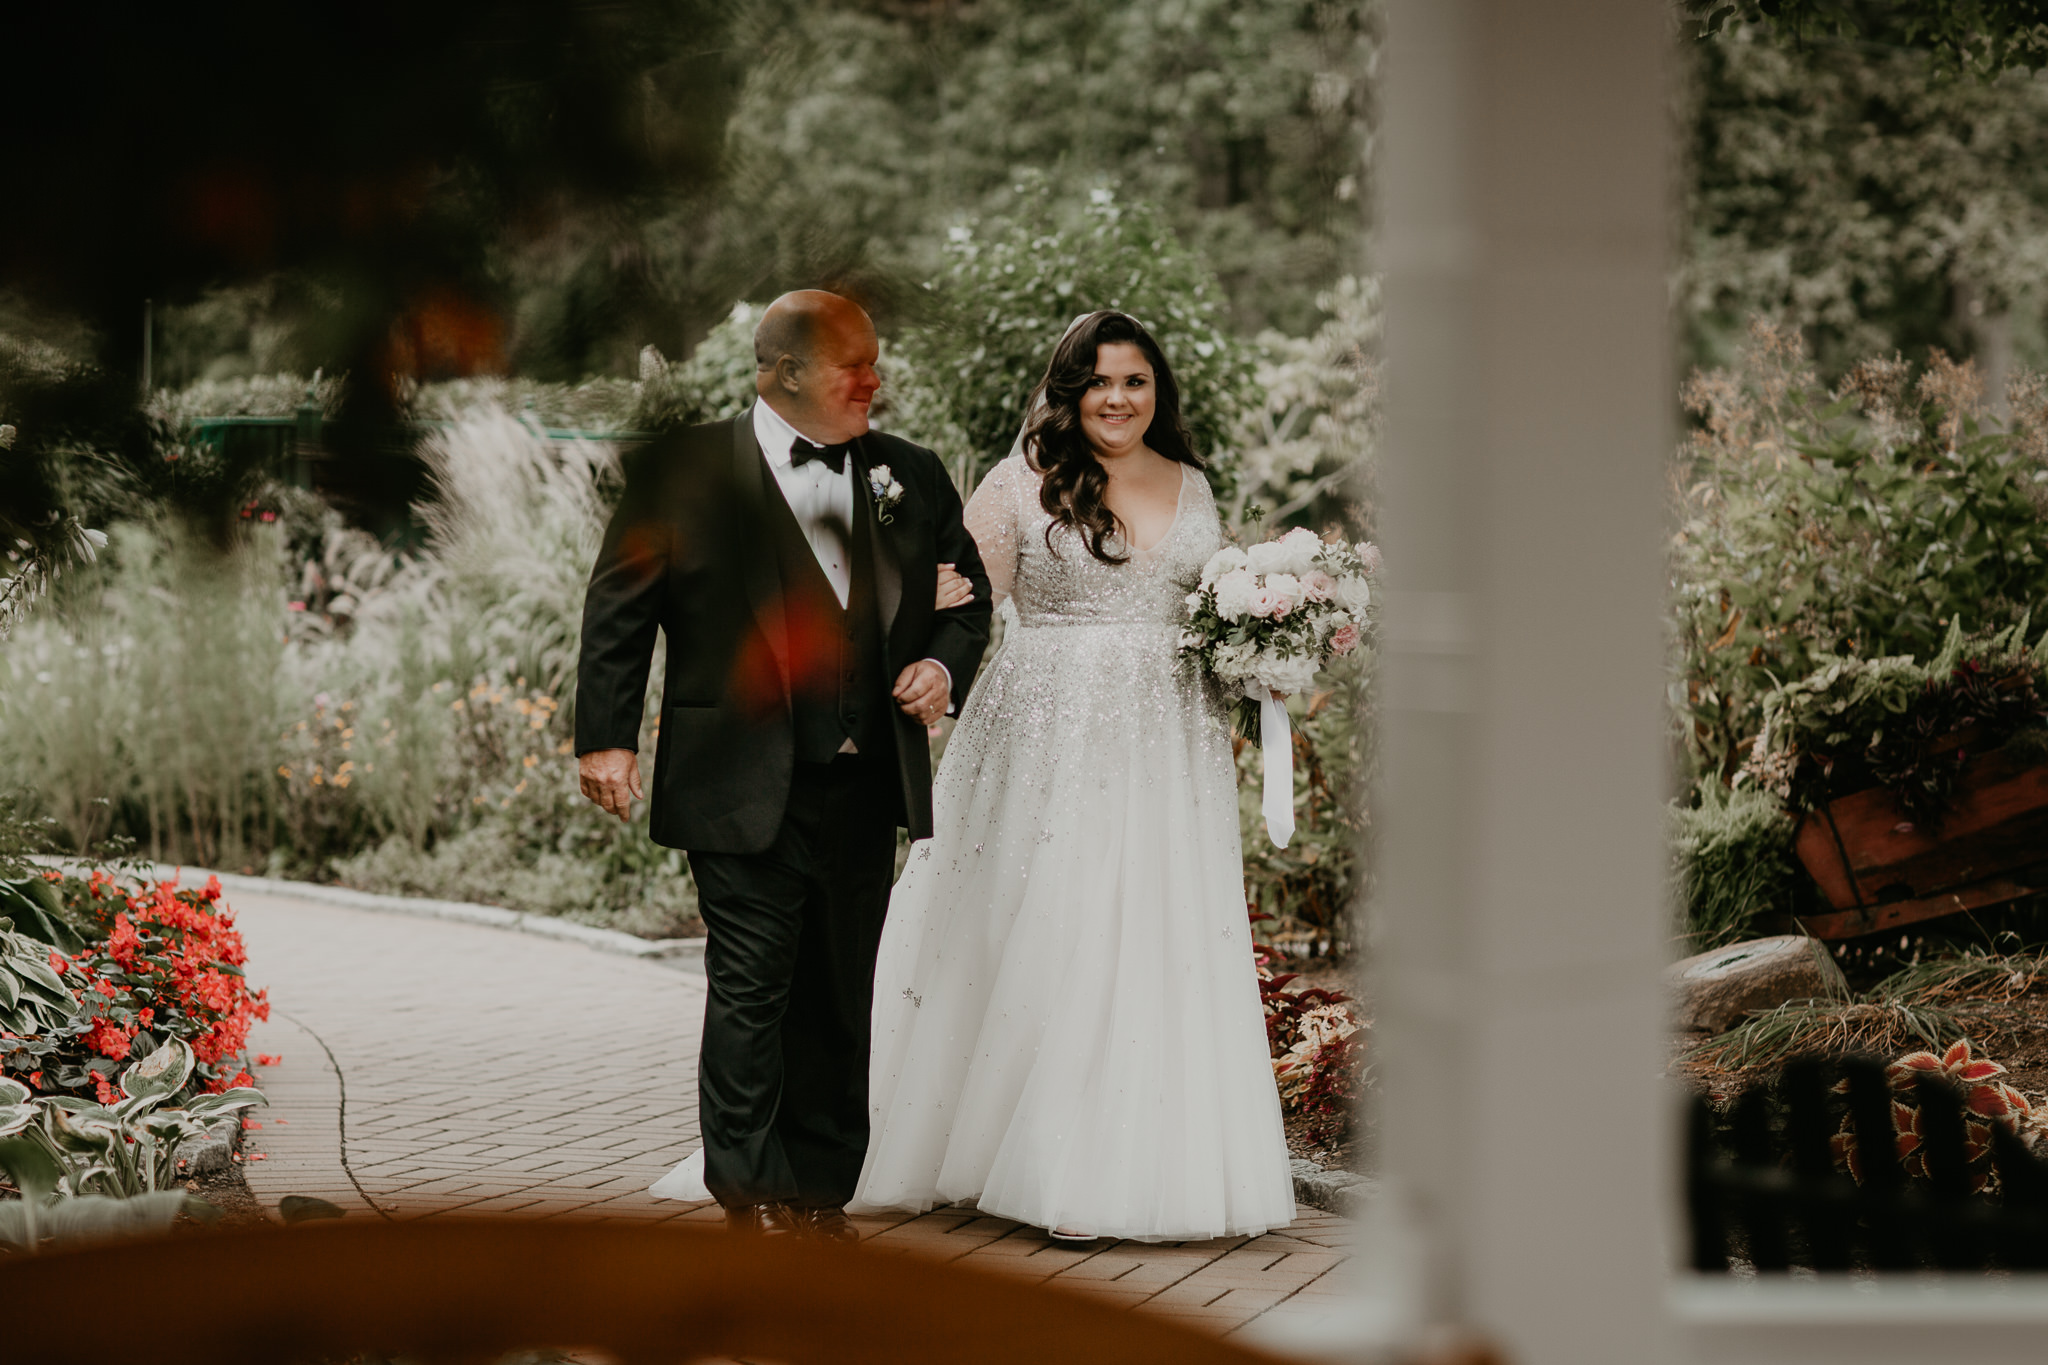 H+A_Hartford_Connecticut_RoseGarden_Wedding020.jpg